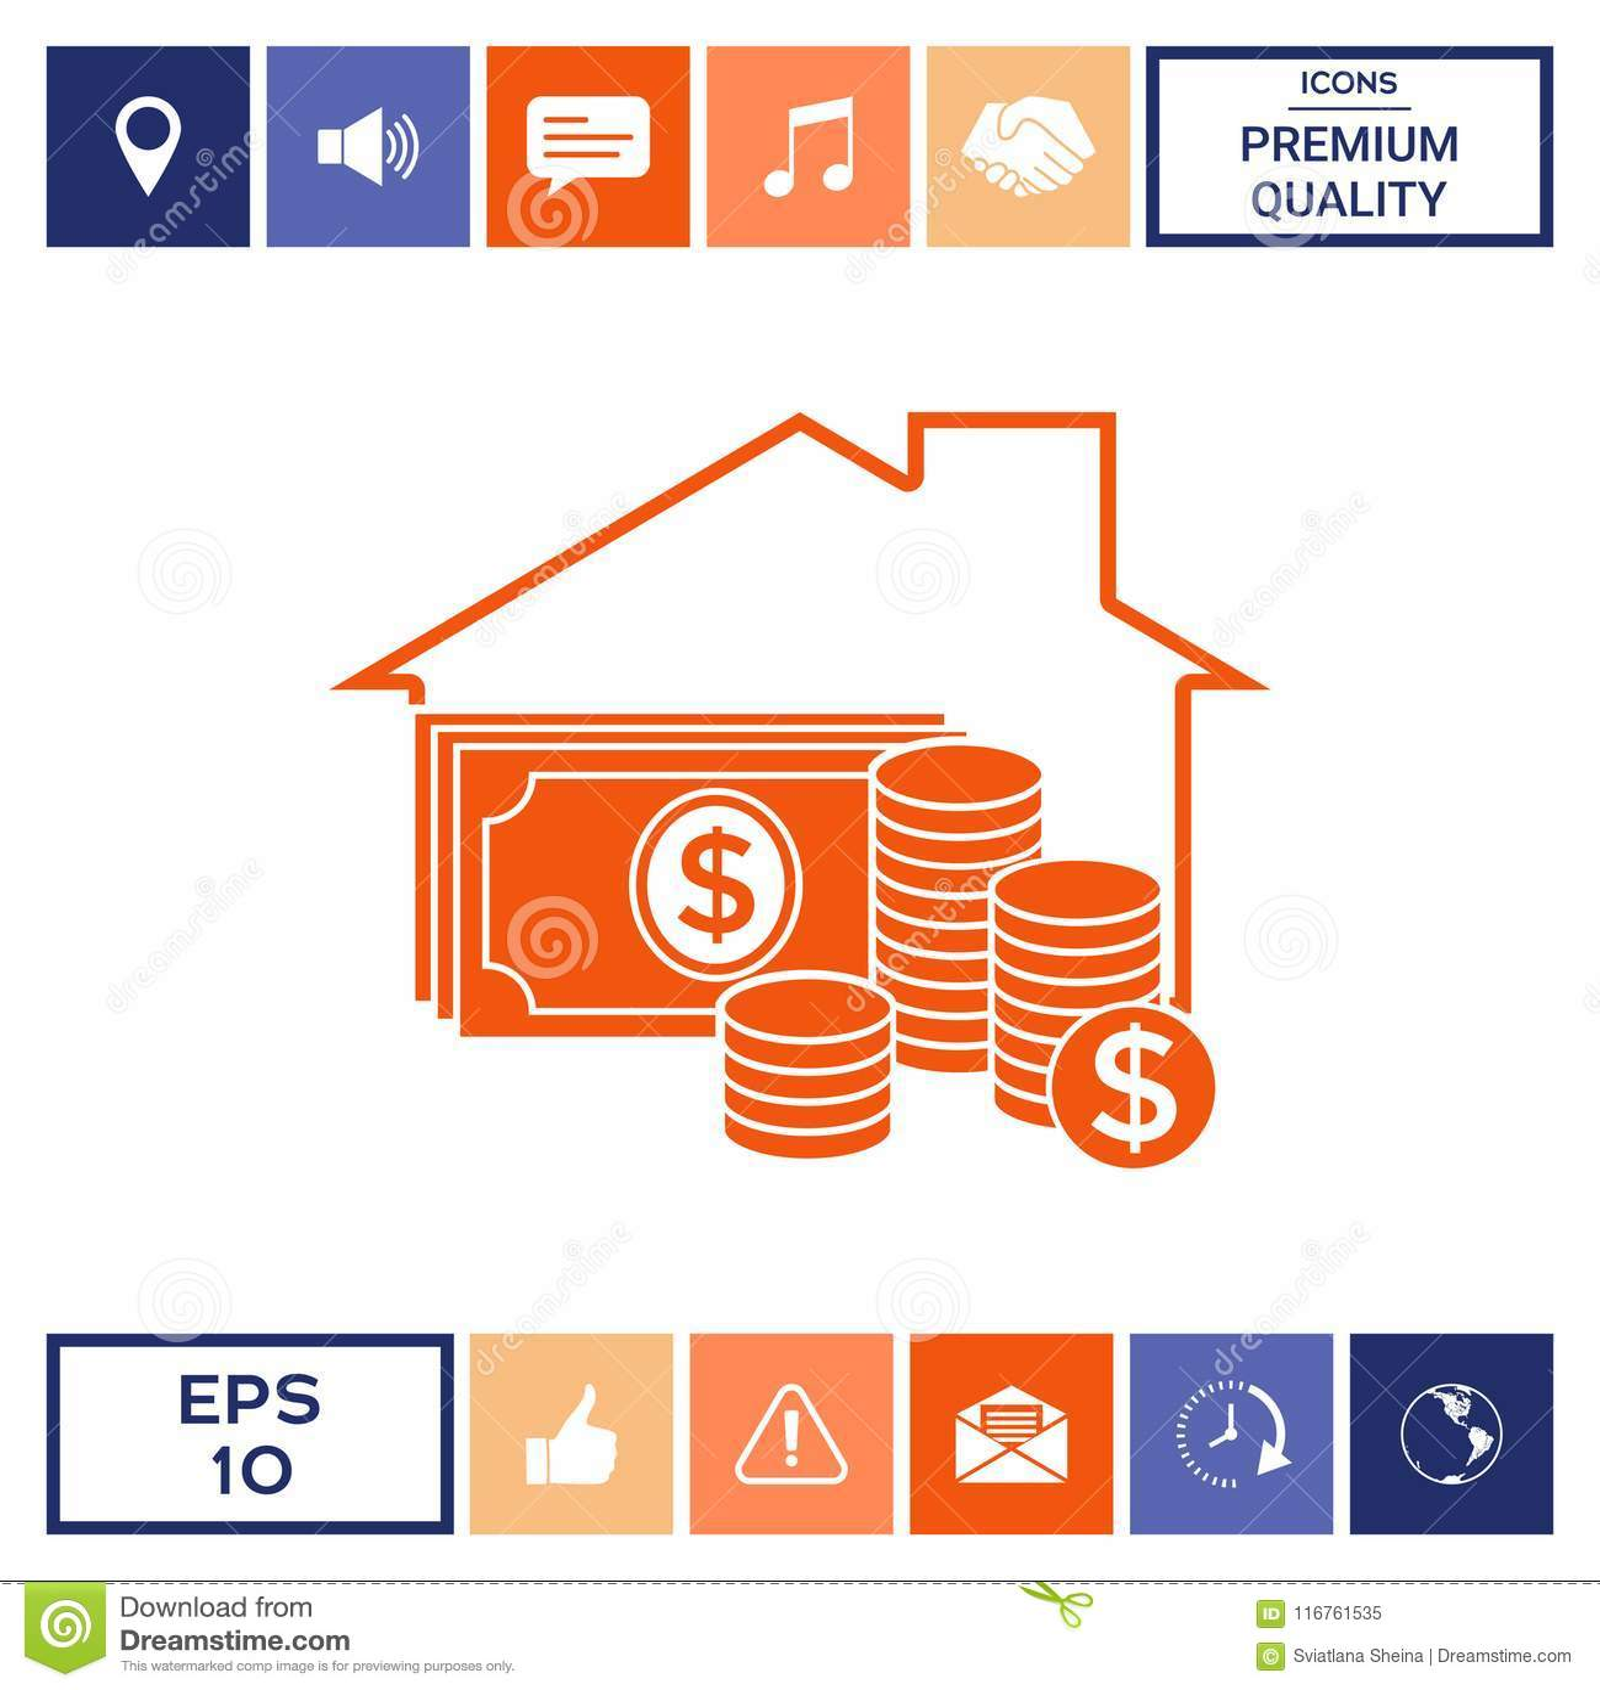 Home insurance icon stock vector. Illustration of dollar ...